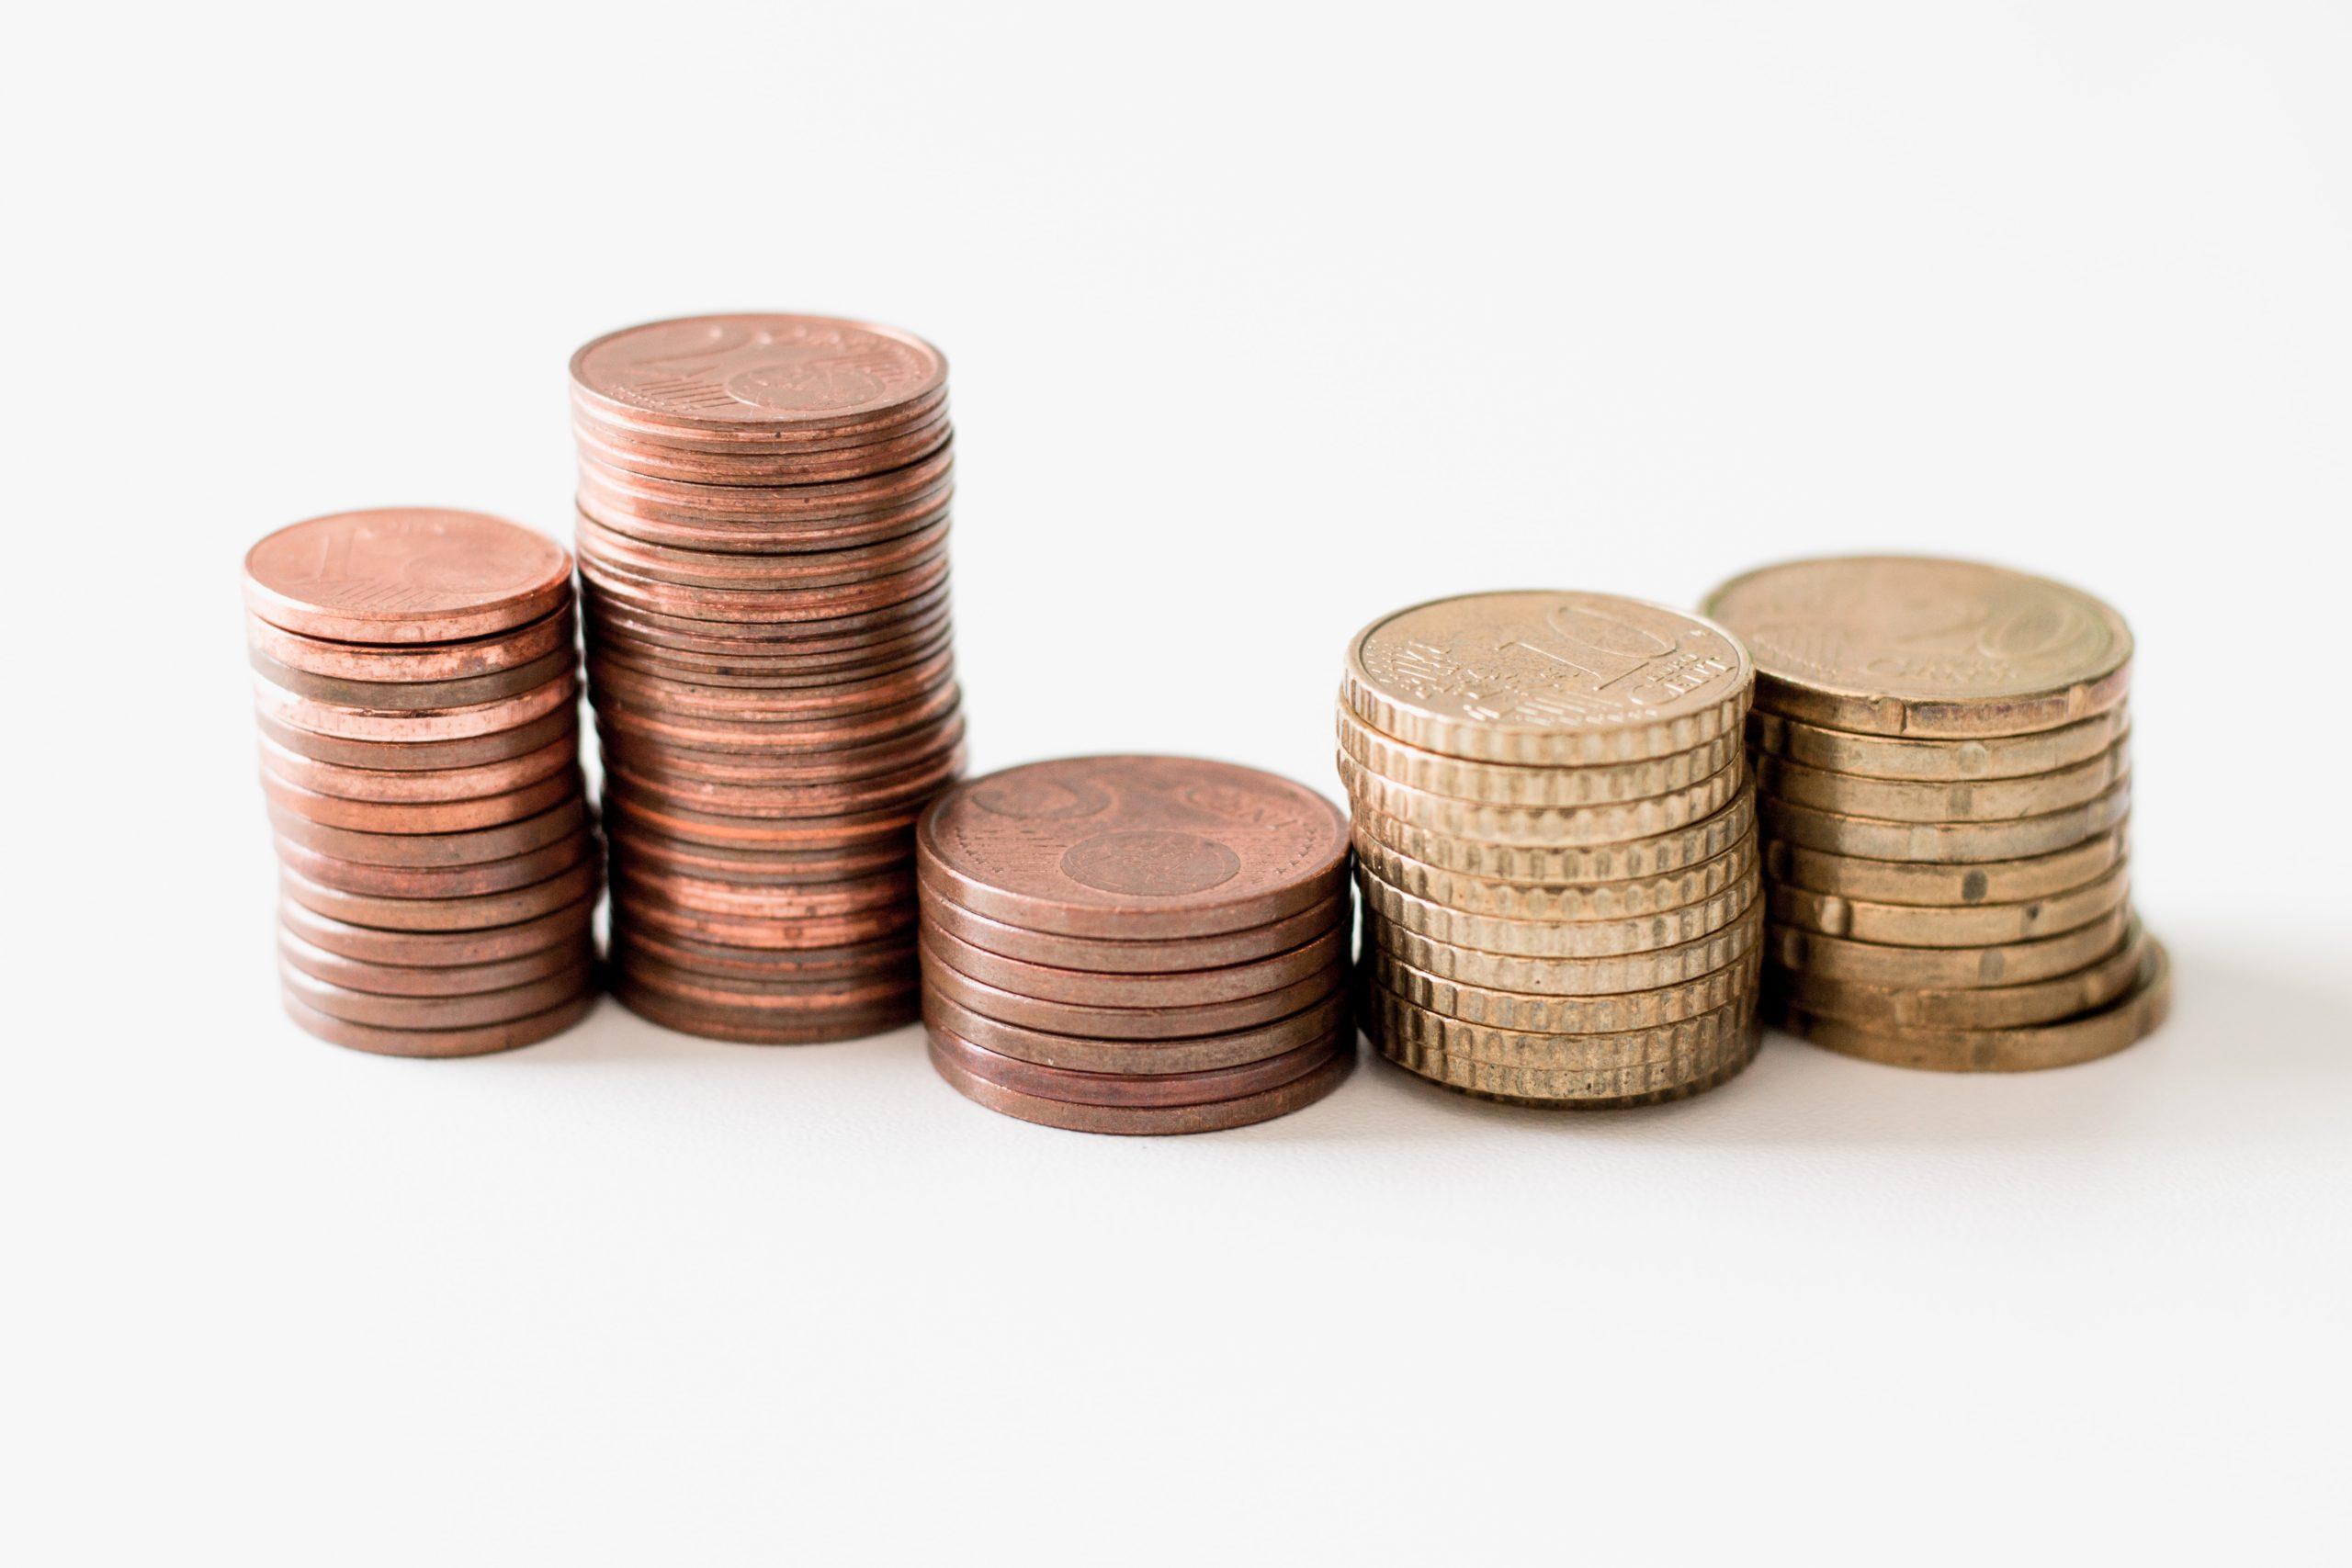 best way to invest £50 per month